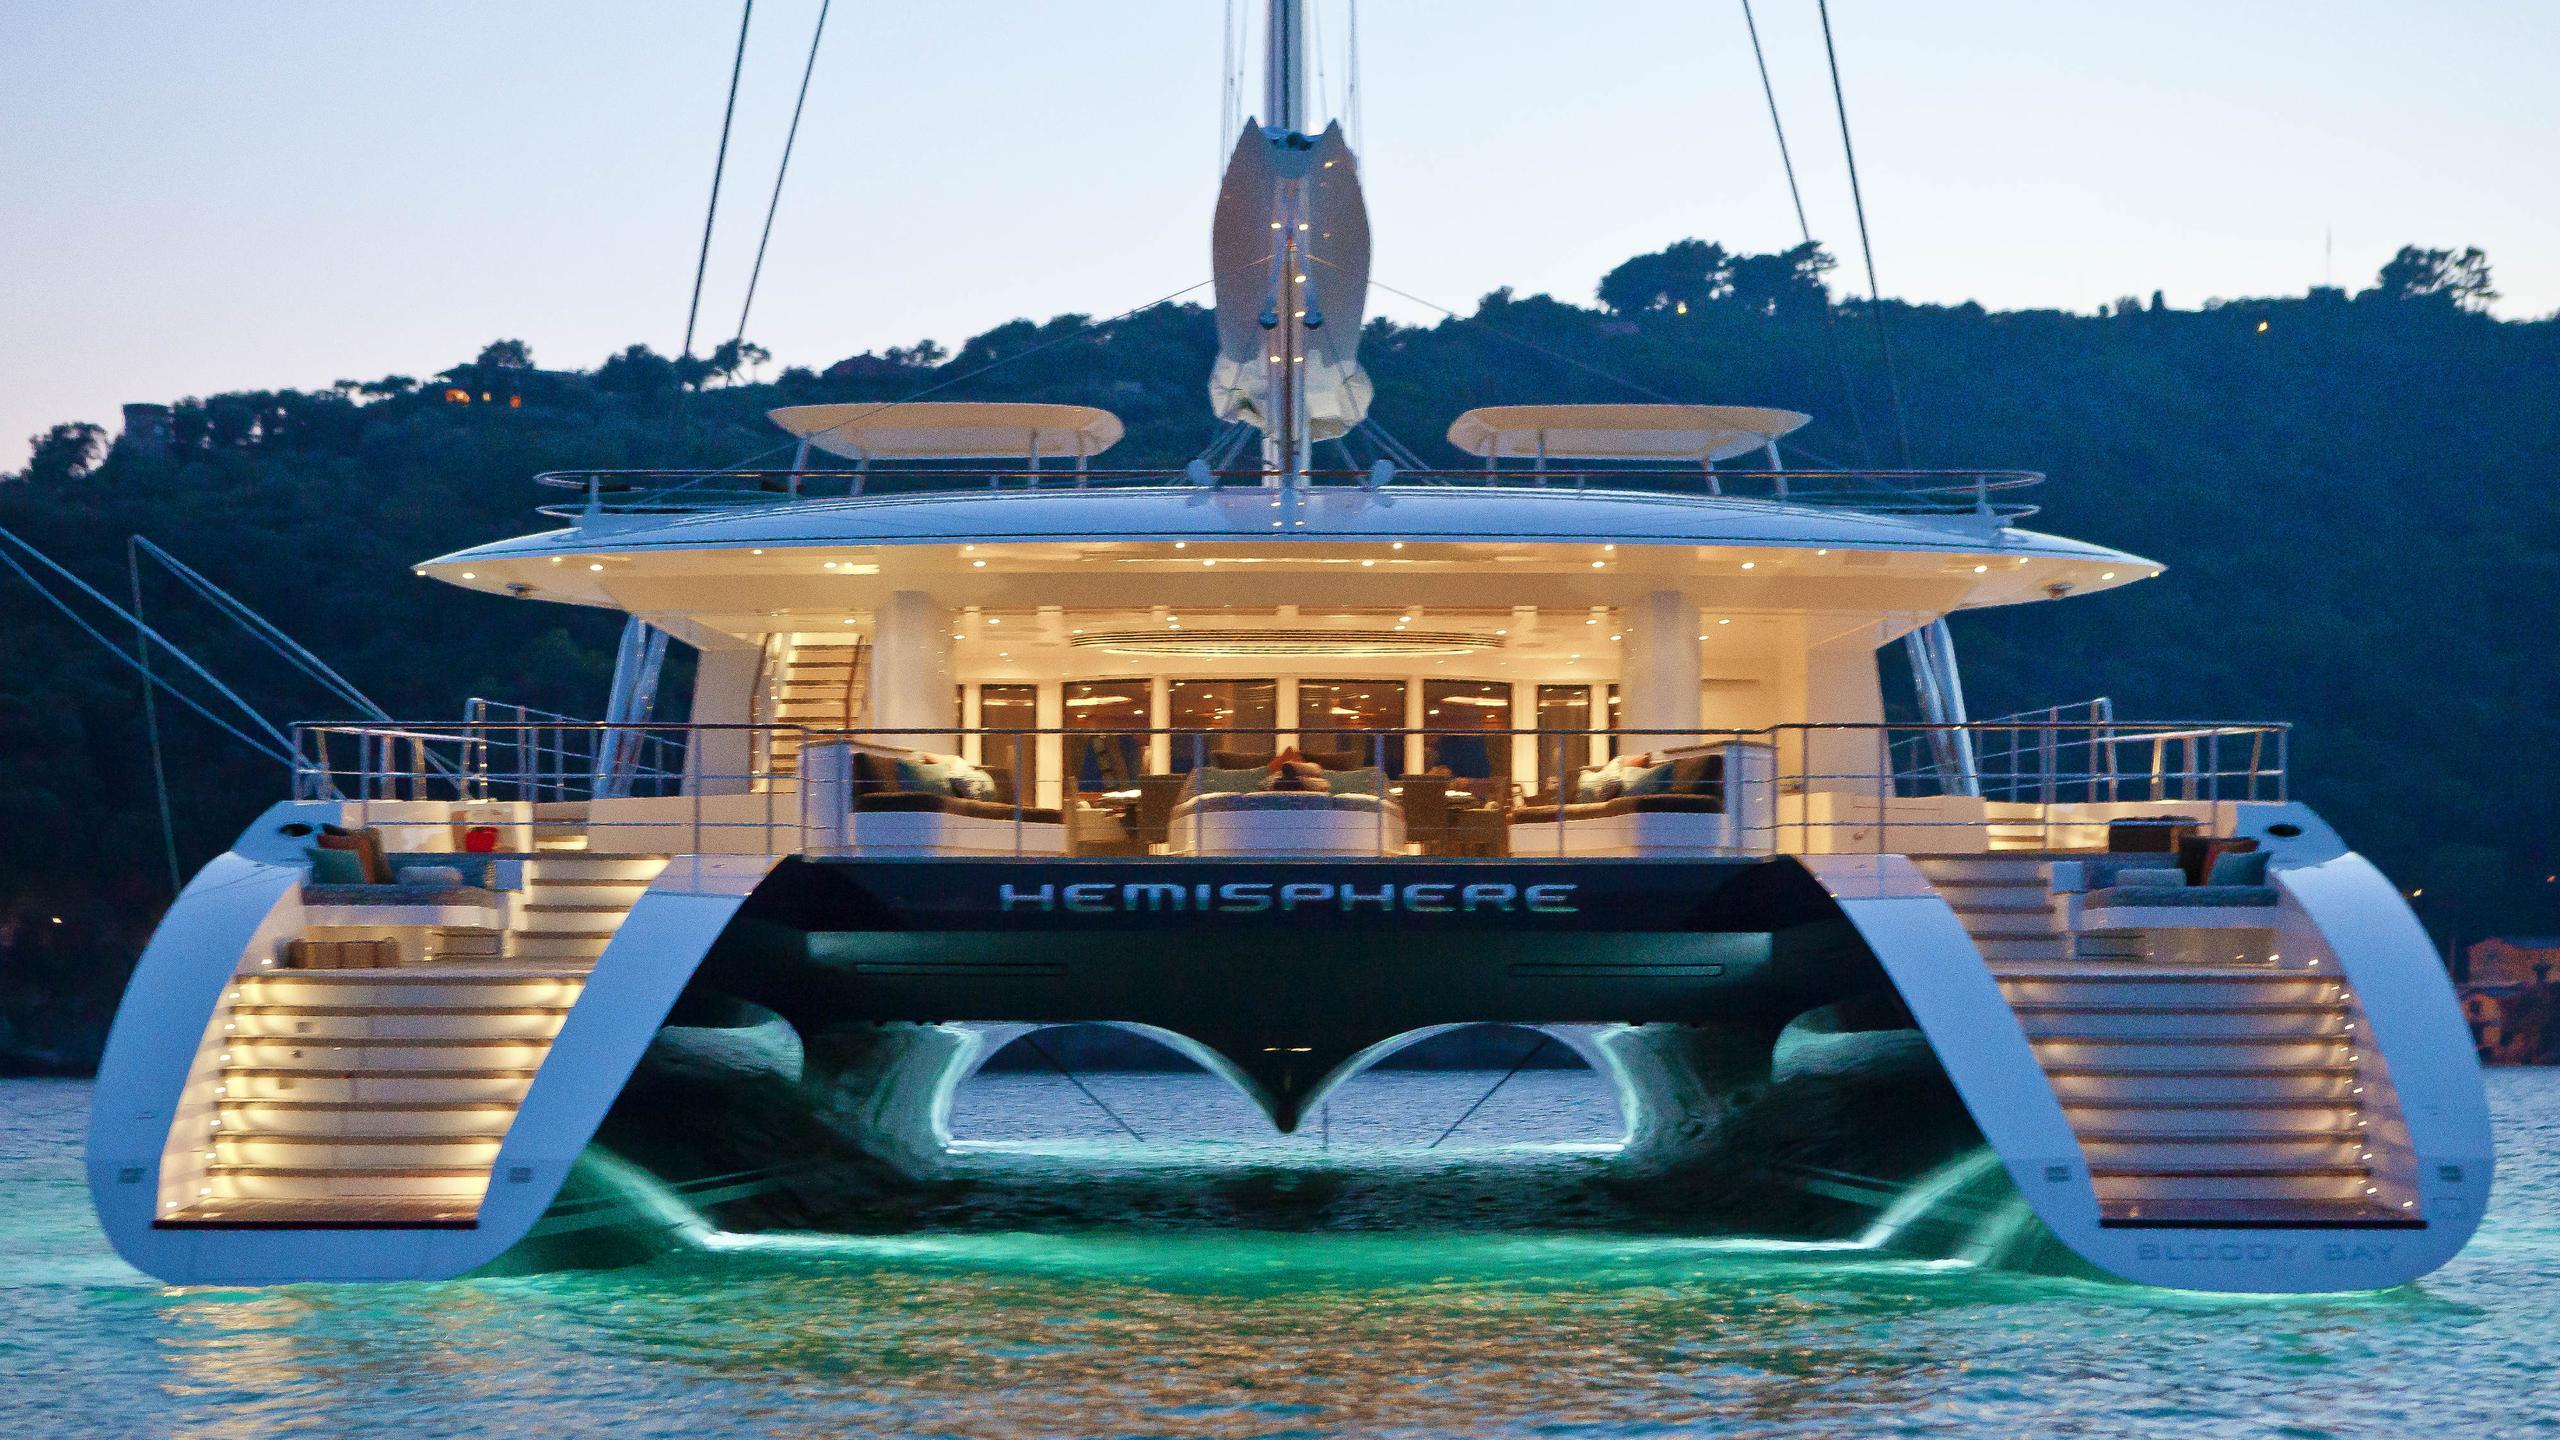 hemisphere-sailing-yacht-pendennis-2011-44m-berth